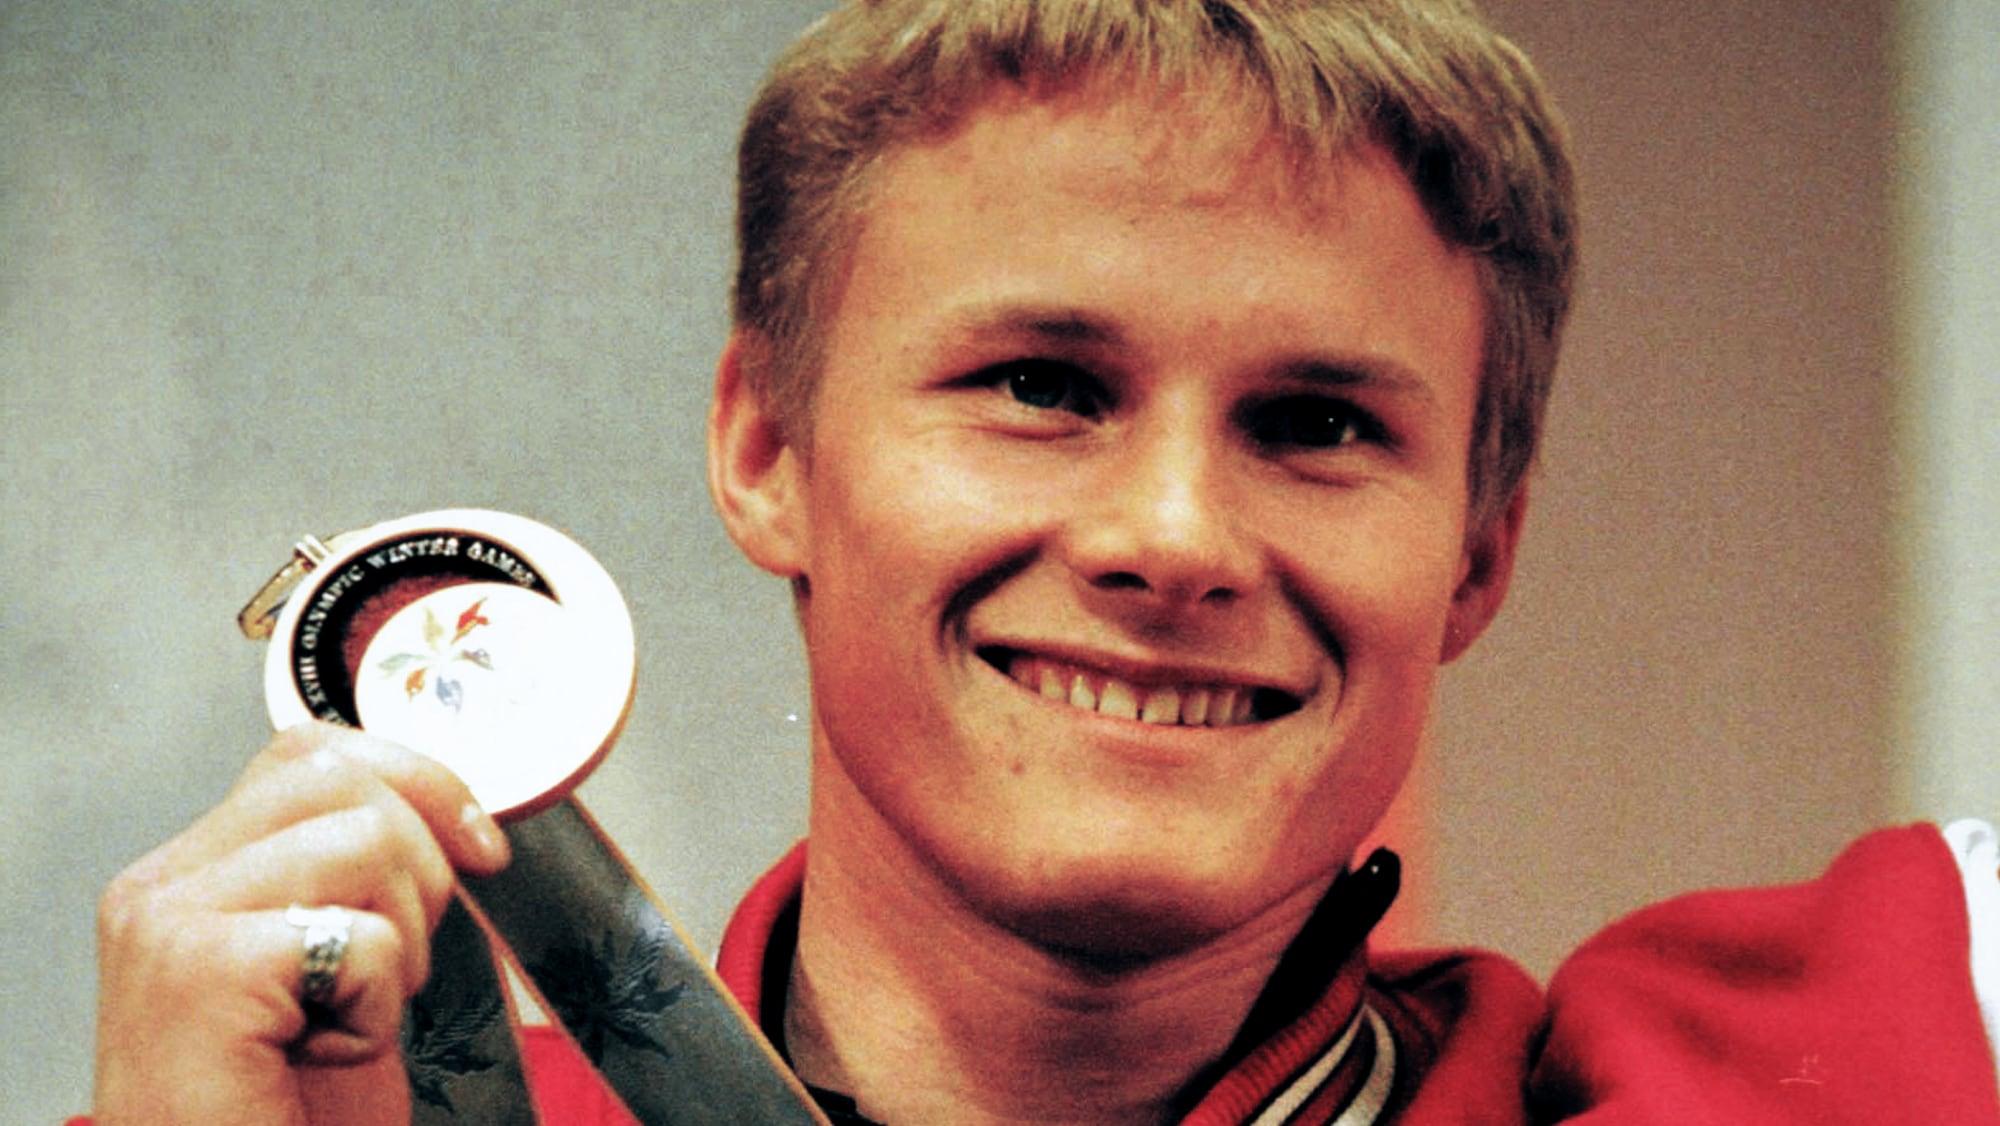 Ross Rebagliati tient sa médaille d'or en souriant.